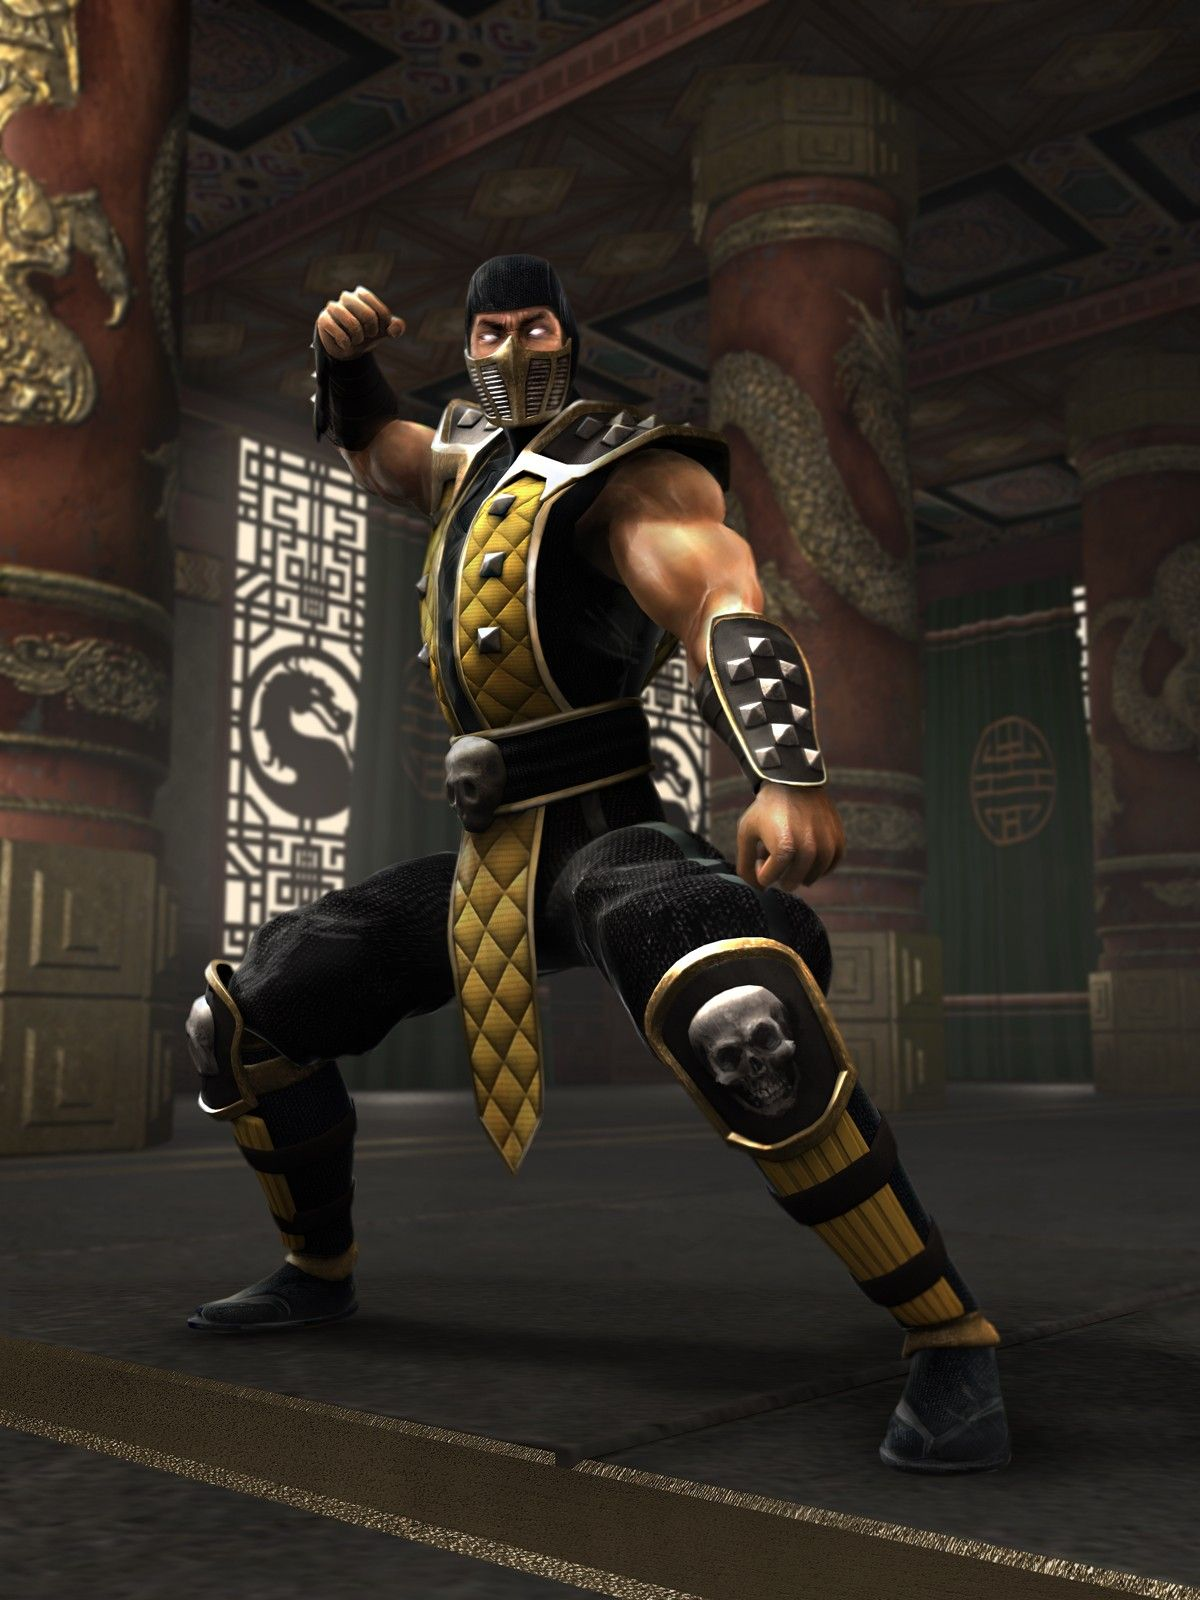 Scorpion Hanzo Hasashi Mortal Kombat Shaolin Monks Mortal Kombat Scorpion Mortal Kombat